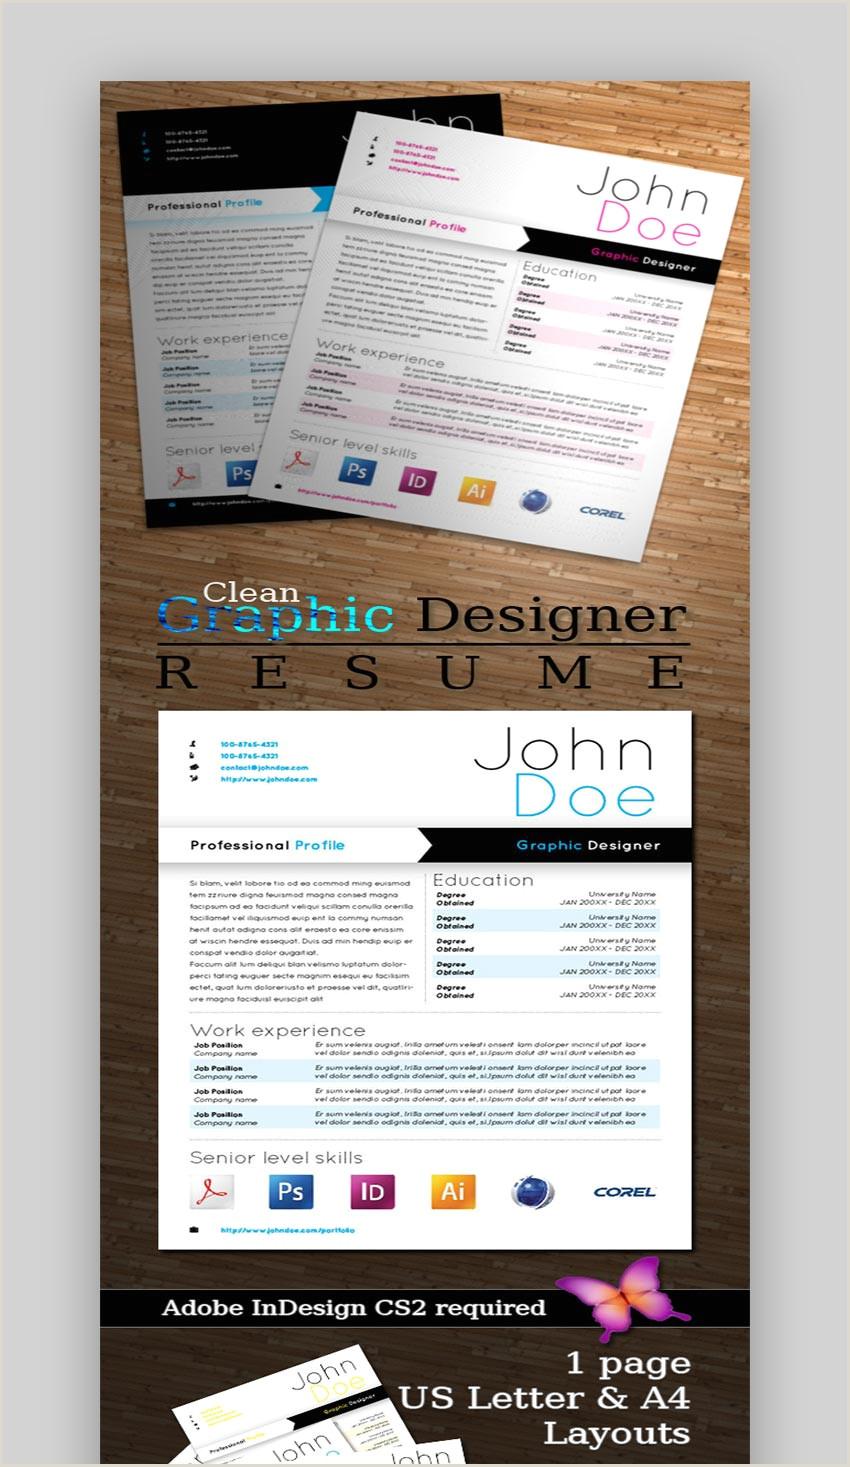 Best Web Graphic Designer Resume Templates For 7